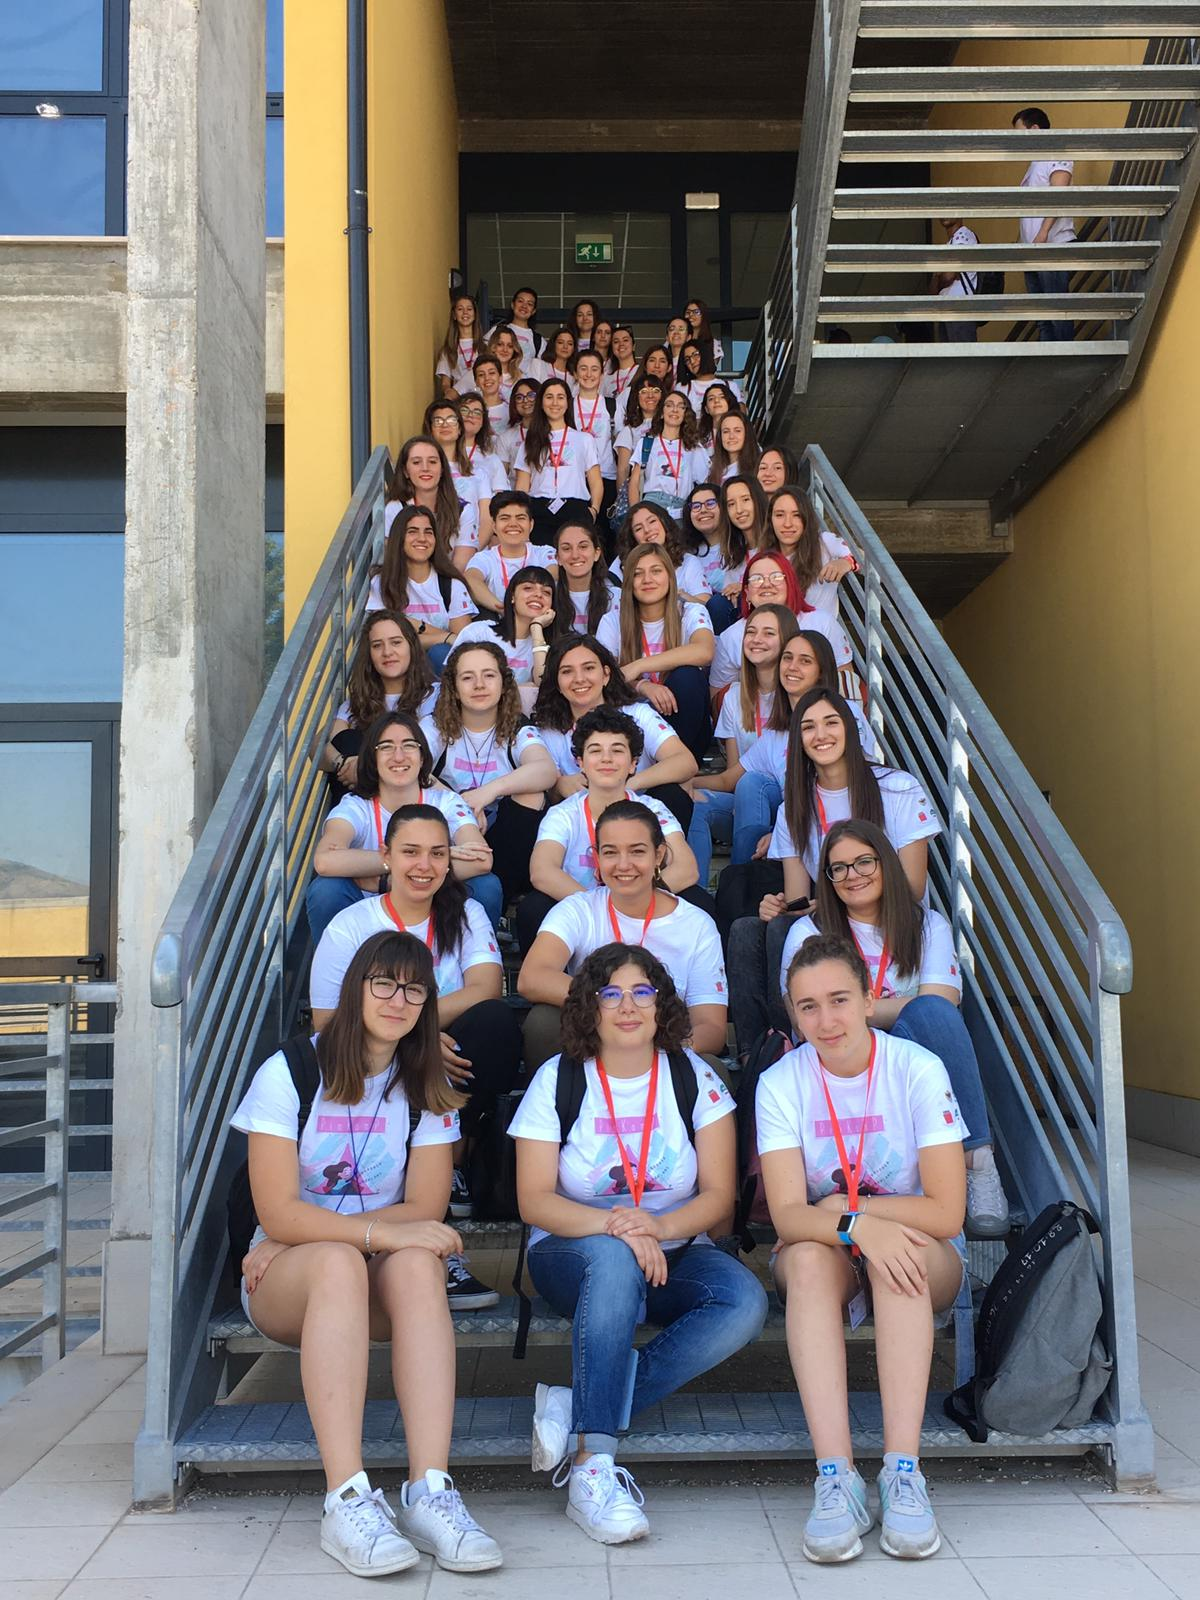 PinKamp: le ragazze contano!